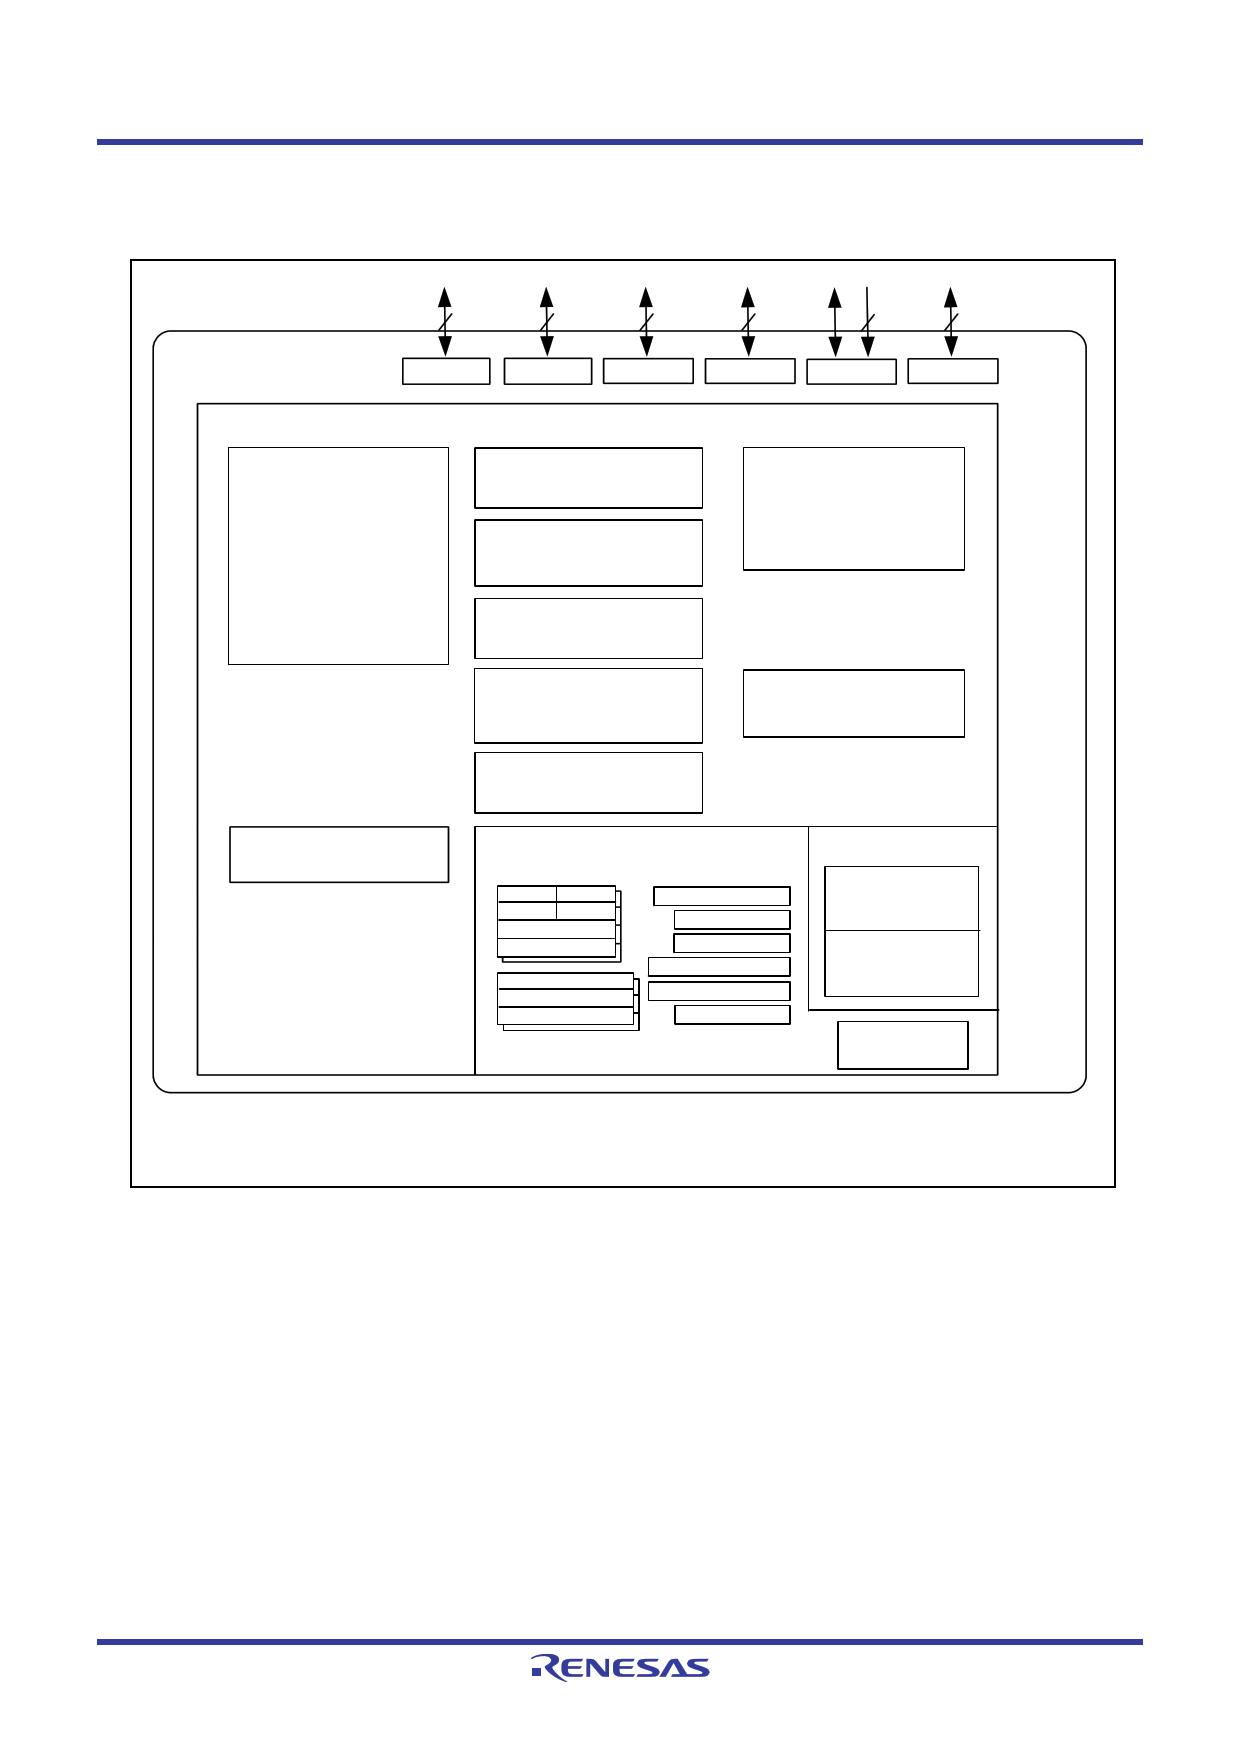 R5F2122CJFP pdf, 반도체, 판매, 대치품